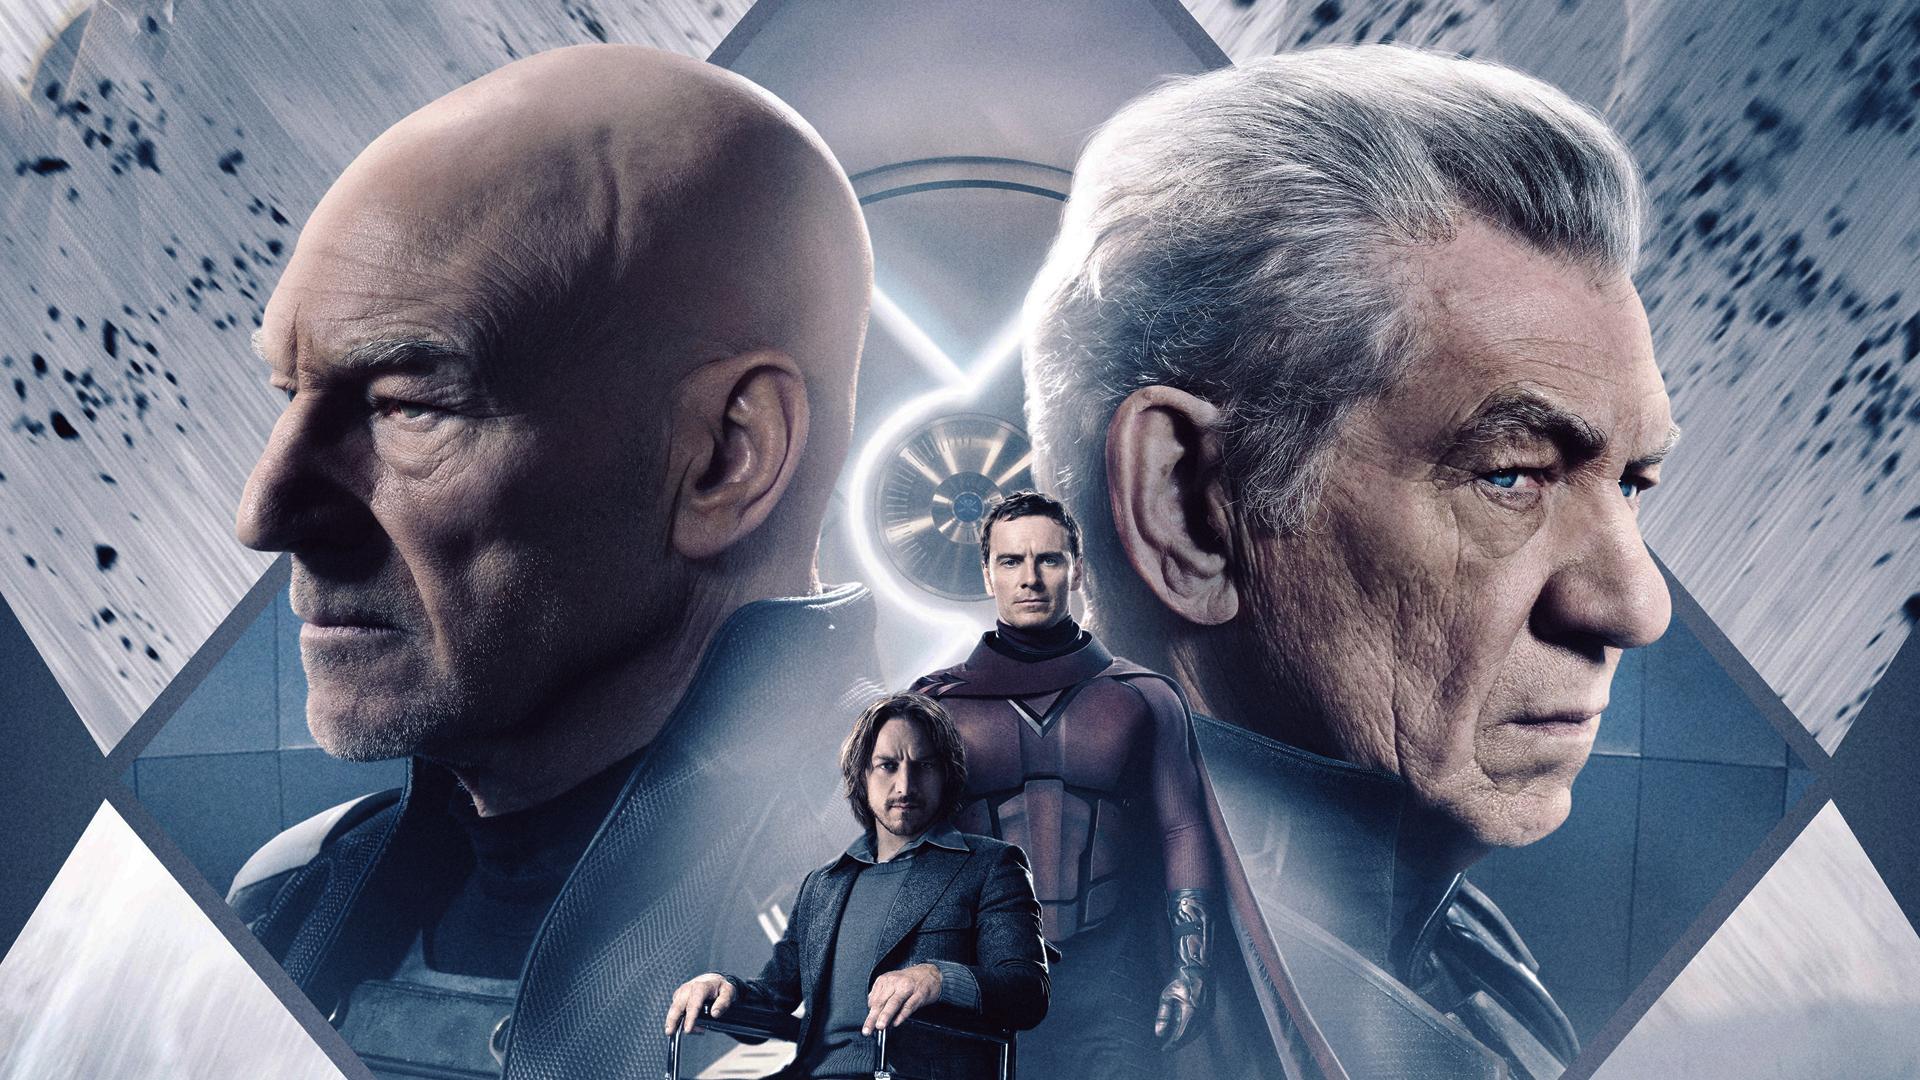 X-Men Days of Future Past wallpaper 19